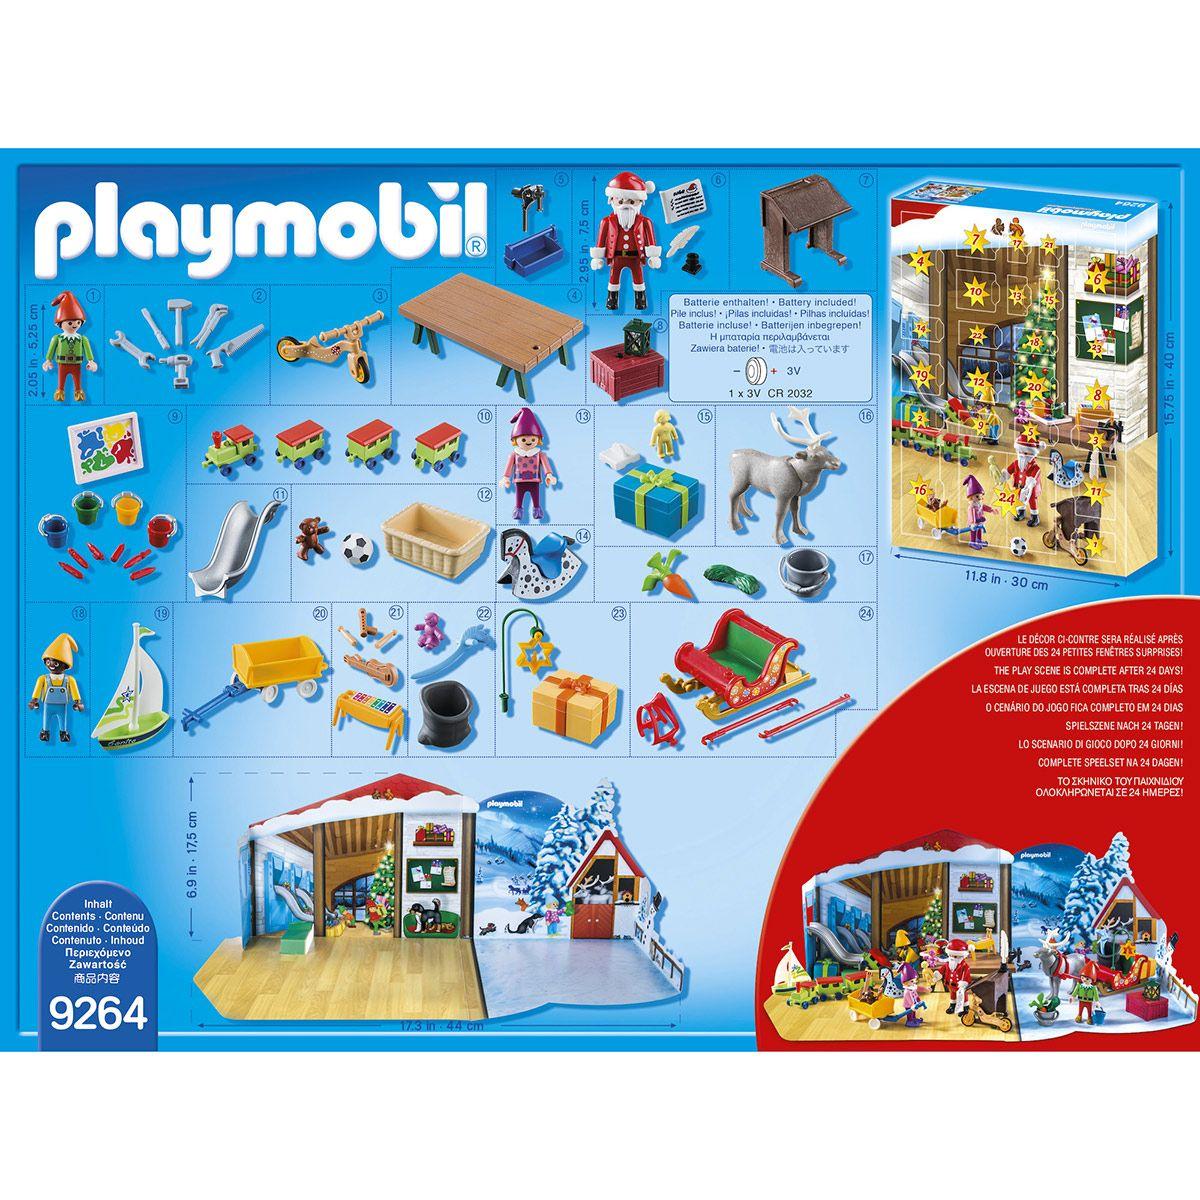 Calendrier L Avent Playmobil.Calendrier De L Avent Pere Noel Playmobil 9264 Jeux De